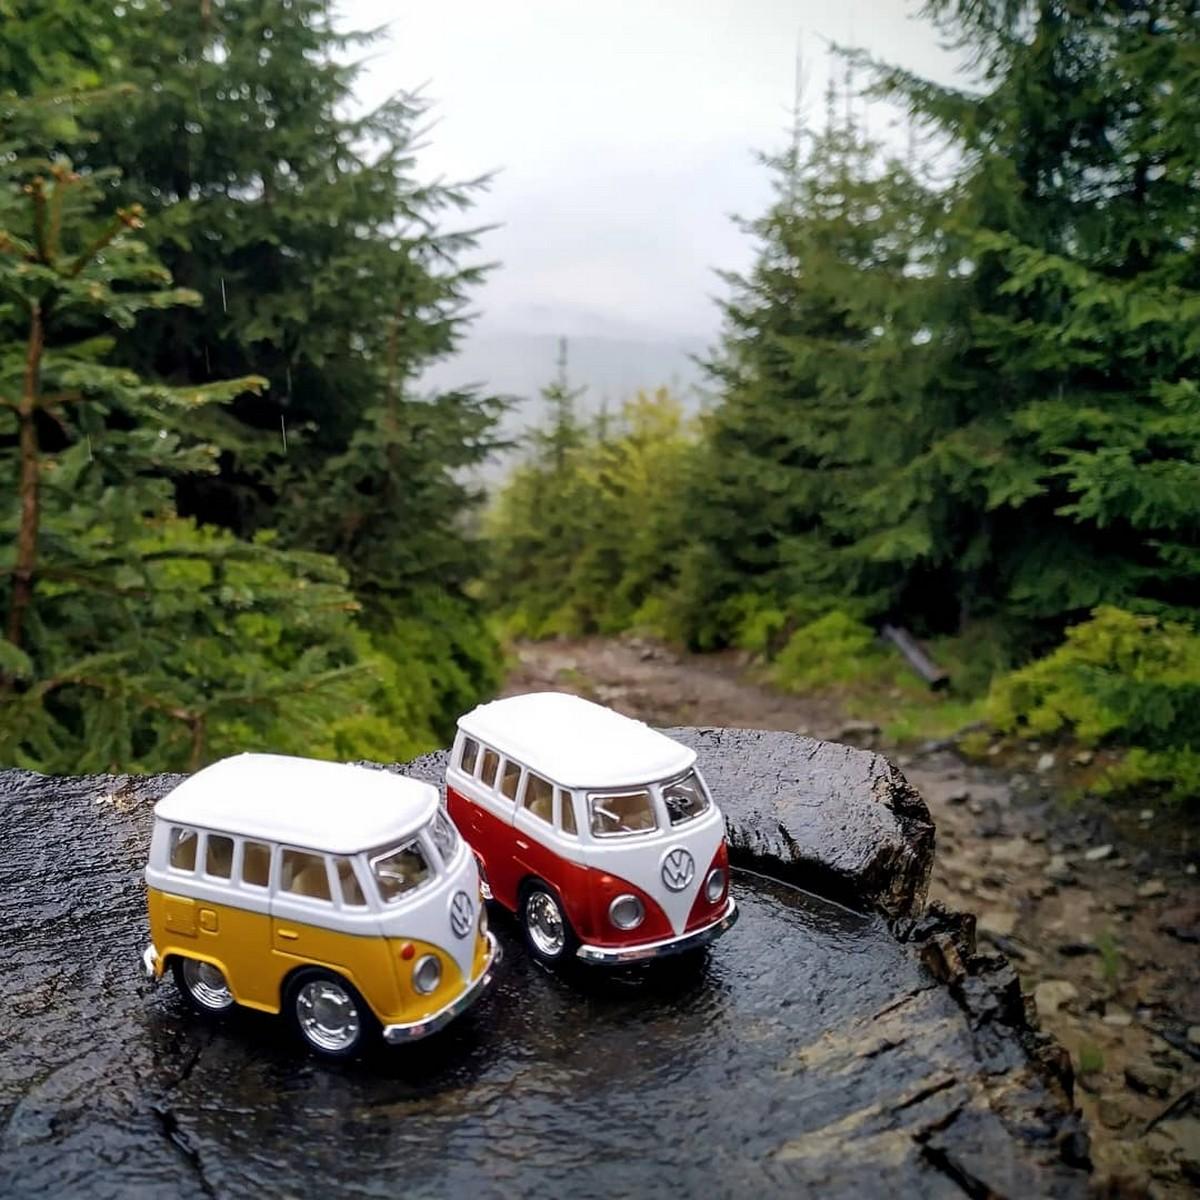 Volkswagen Little Model Car  Diecast Assortments by Kinsfun/kinsmart pull back action